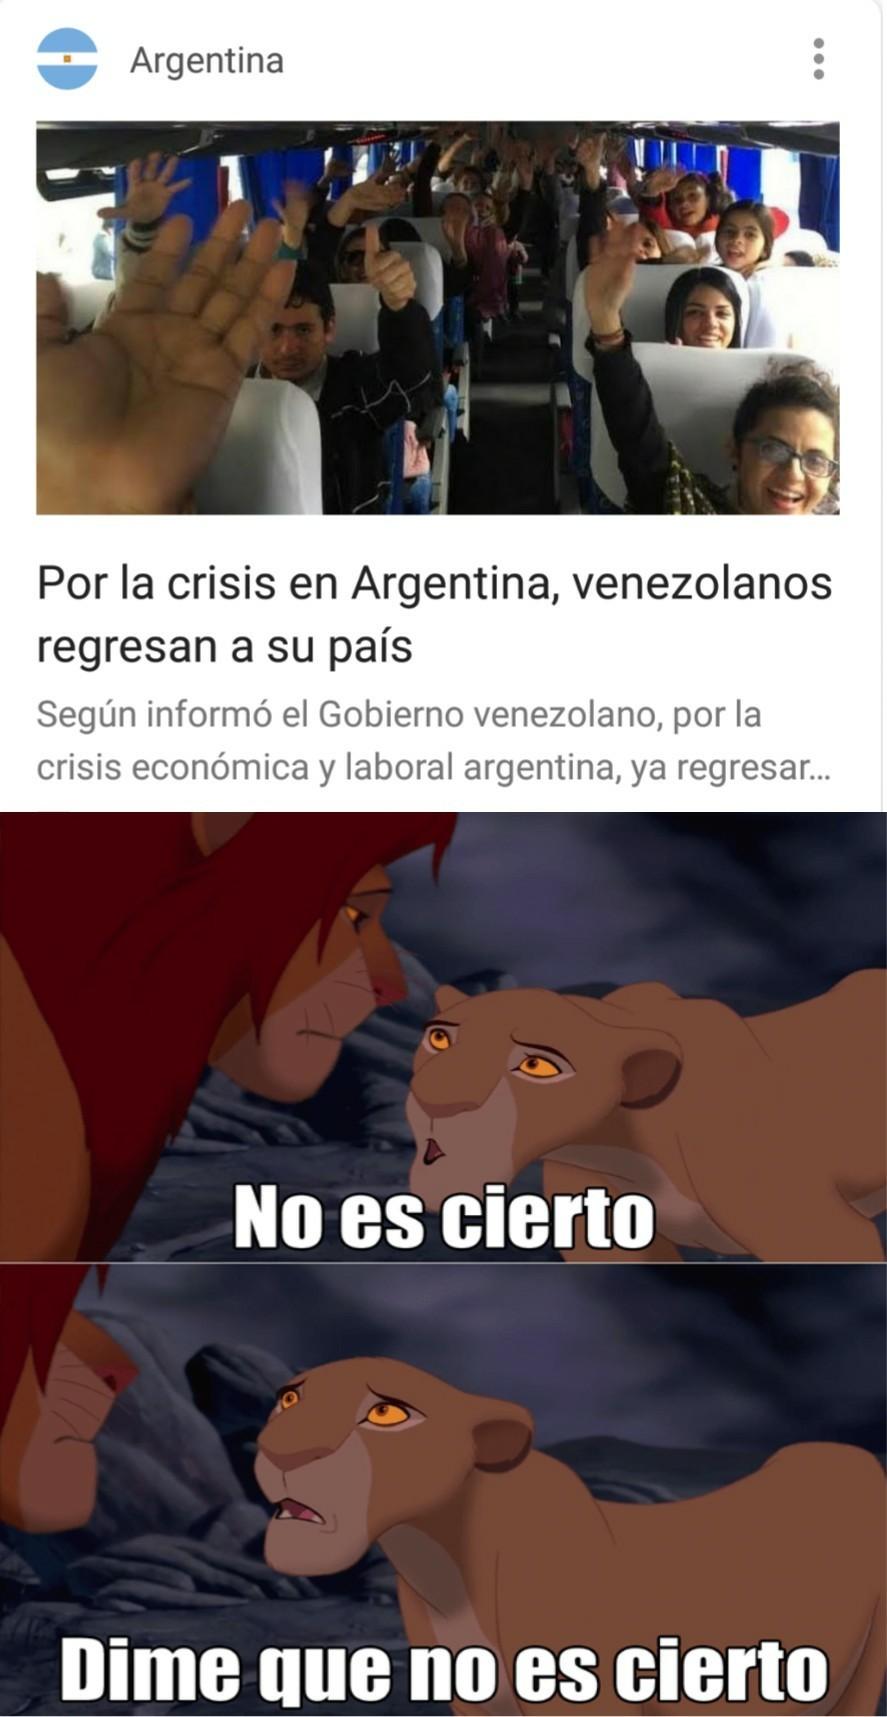 Argentina en 2018 ah - meme